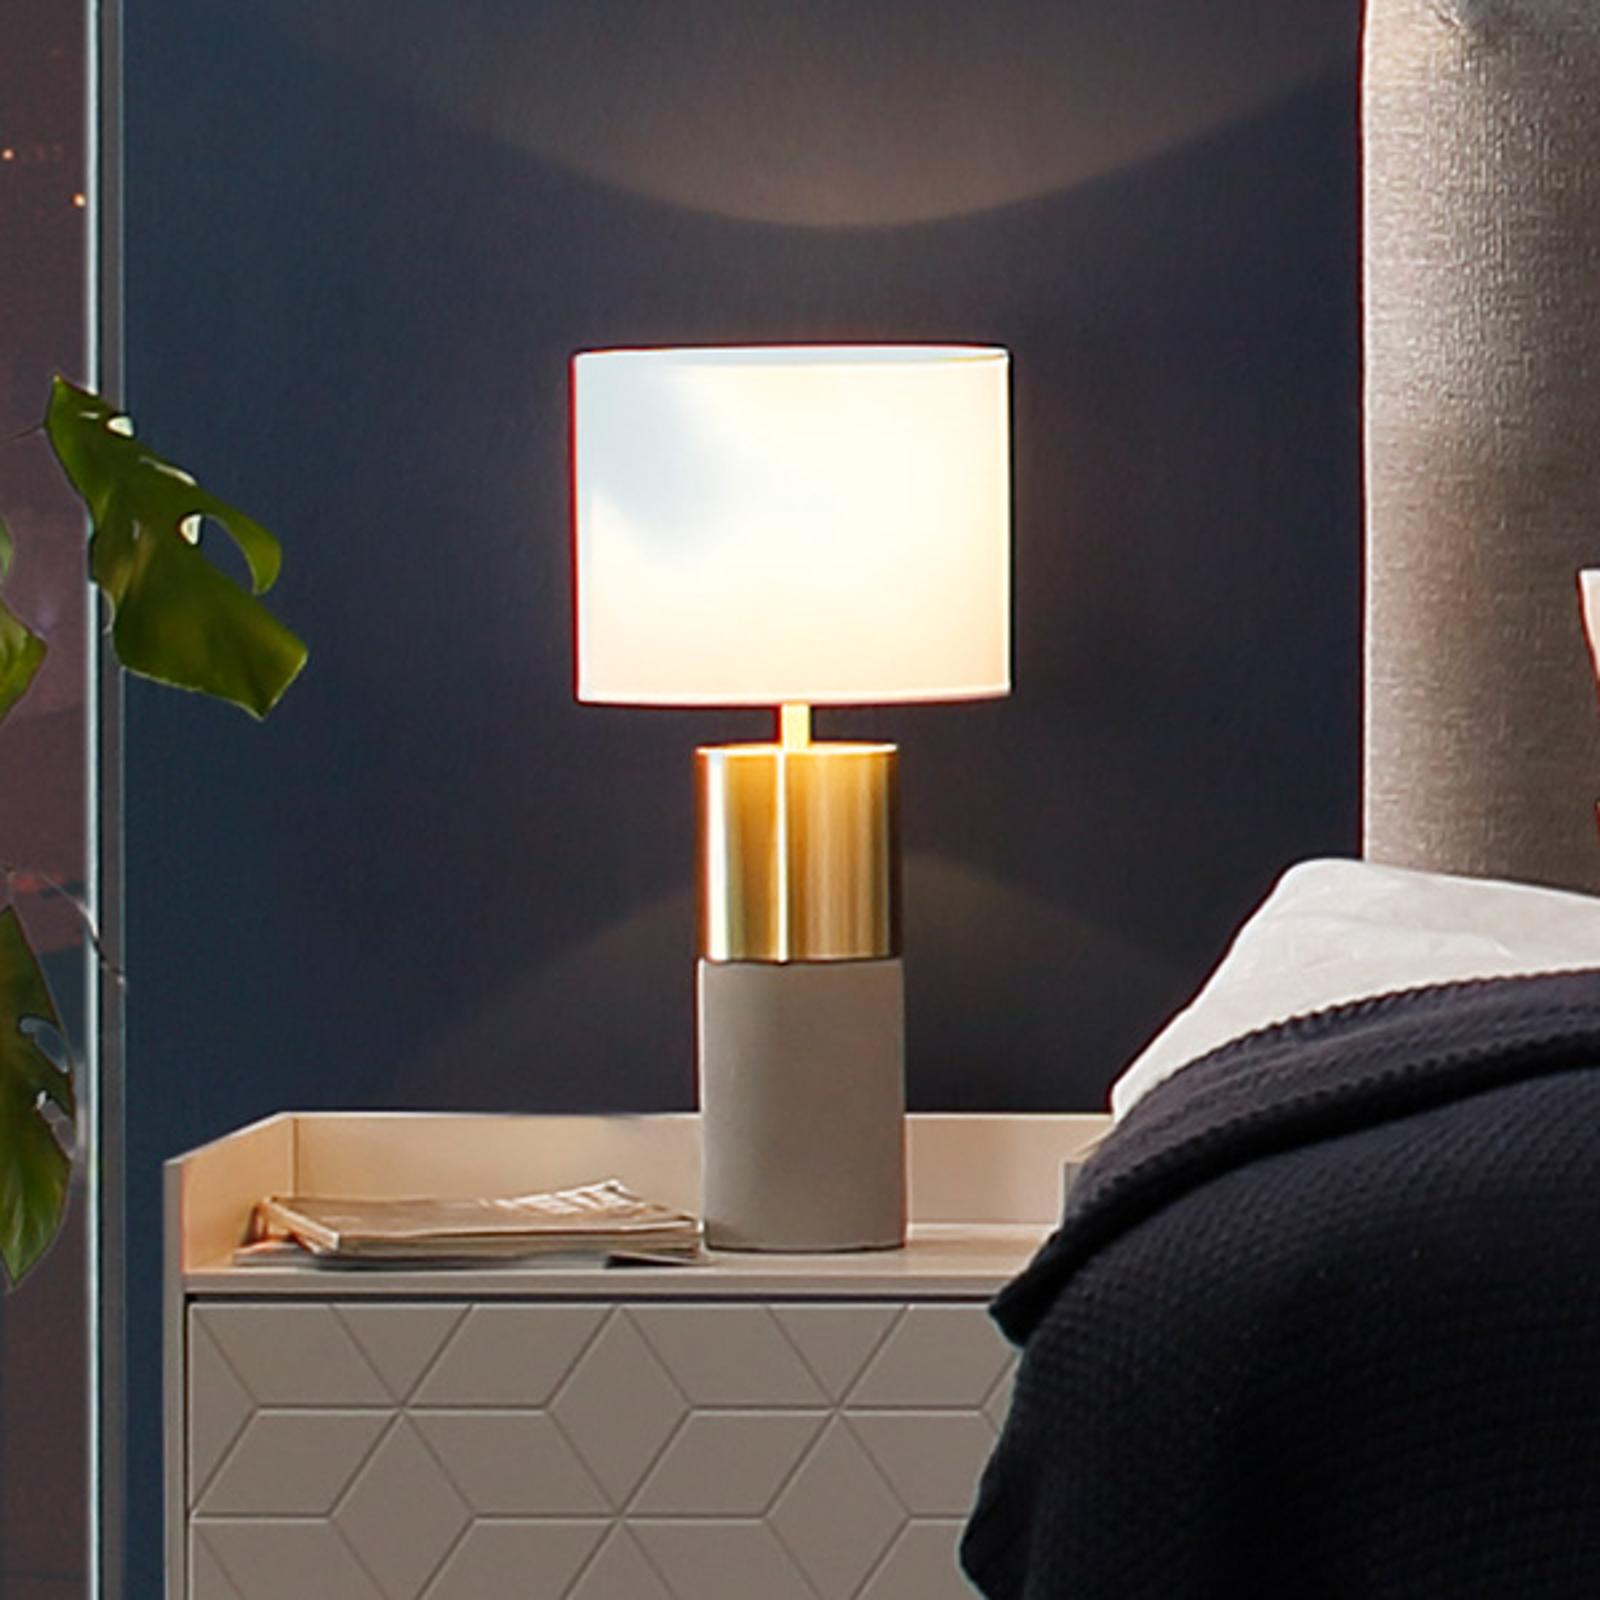 Villeroy & Boch Turin lampe à poser béton 33cm